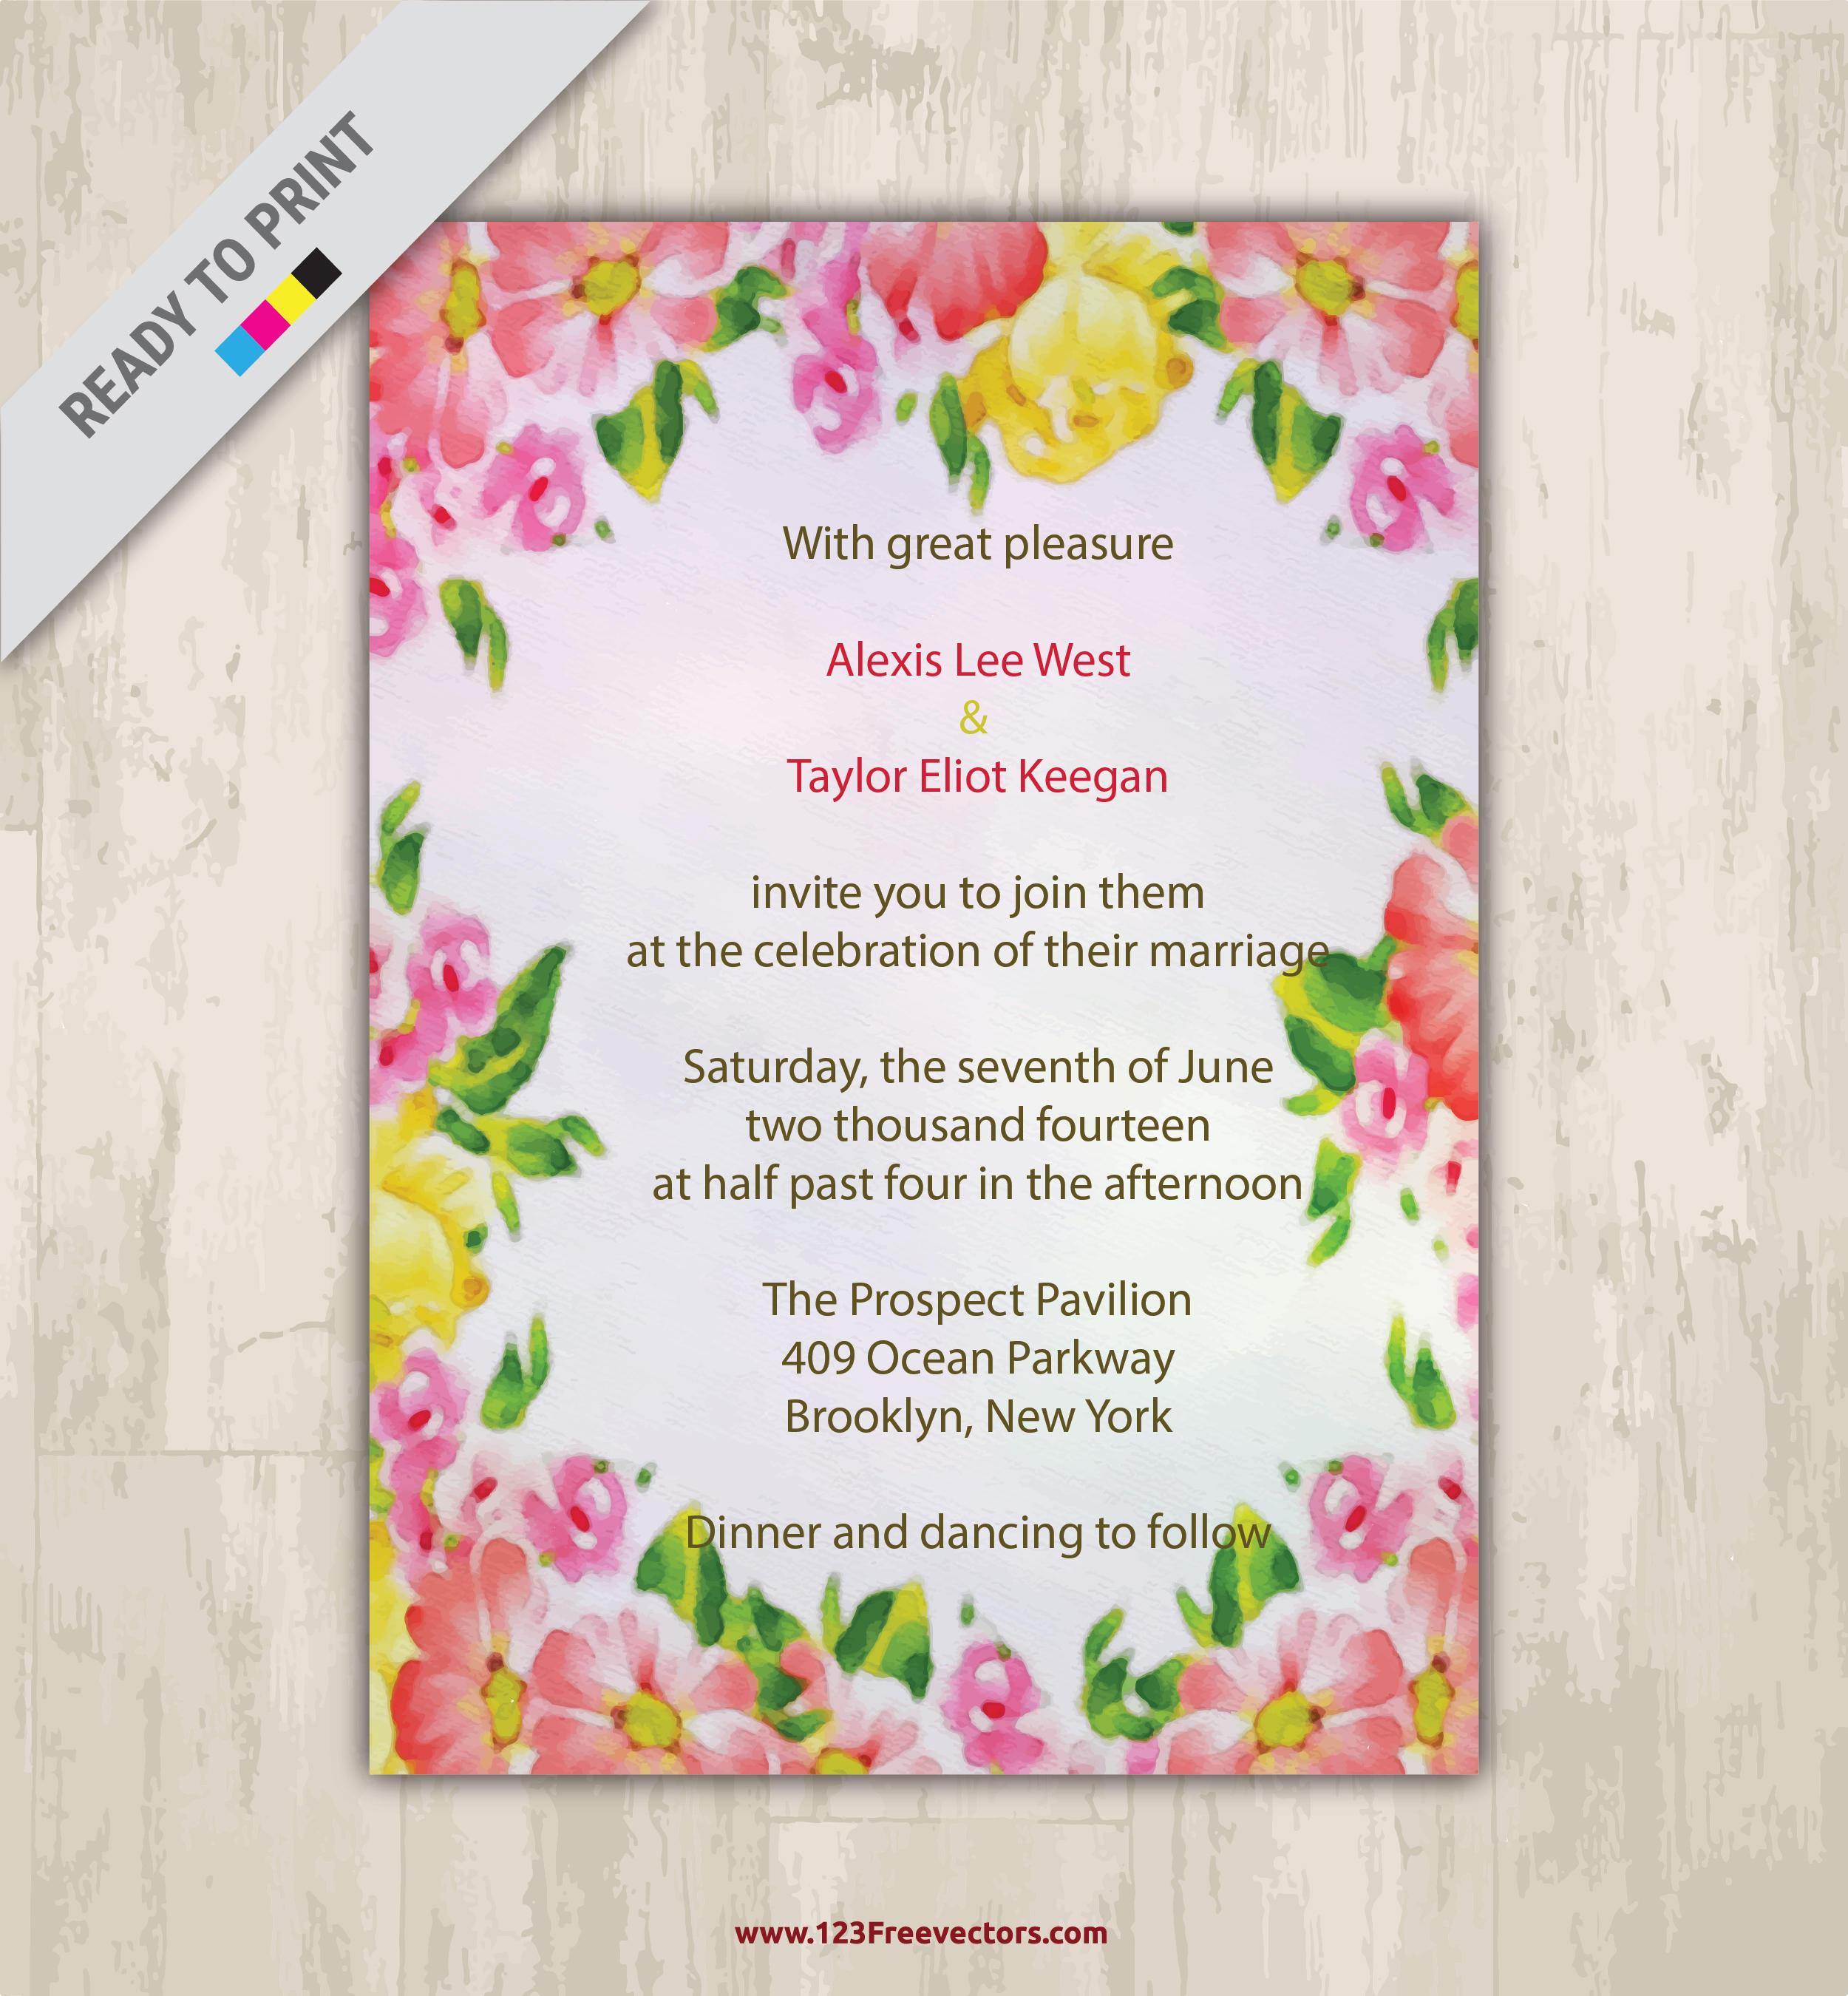 Floral Watercolor Wedding Invitation Vector Graphics | 123Freevectors